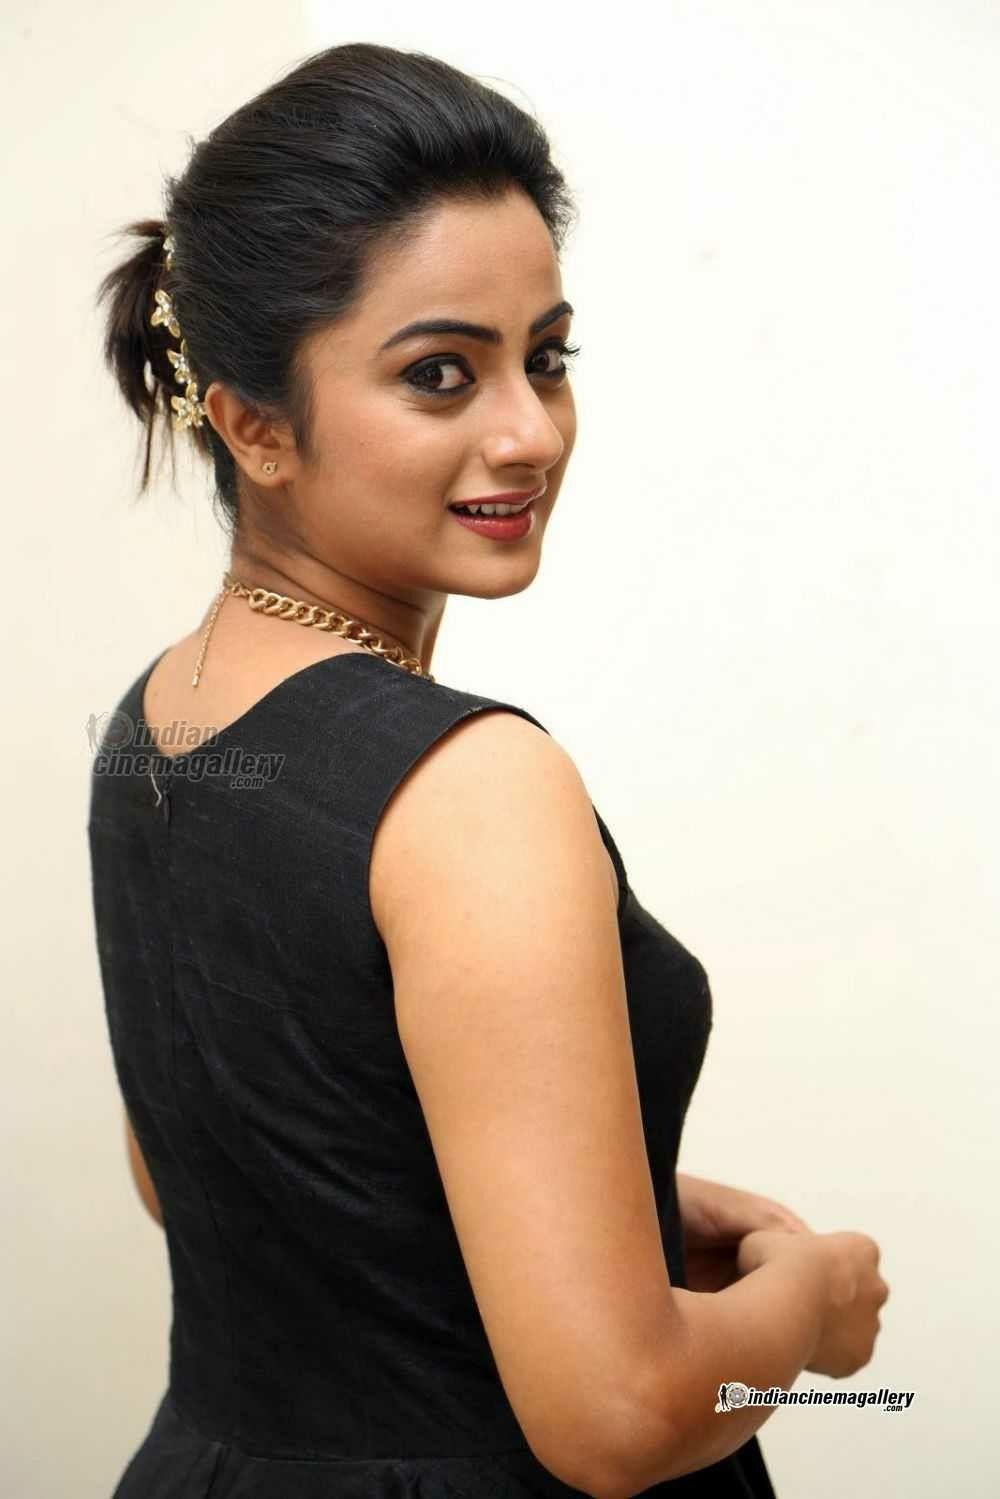 Pin by Sixface on Namitha pramod | Indian actress hot pics ...